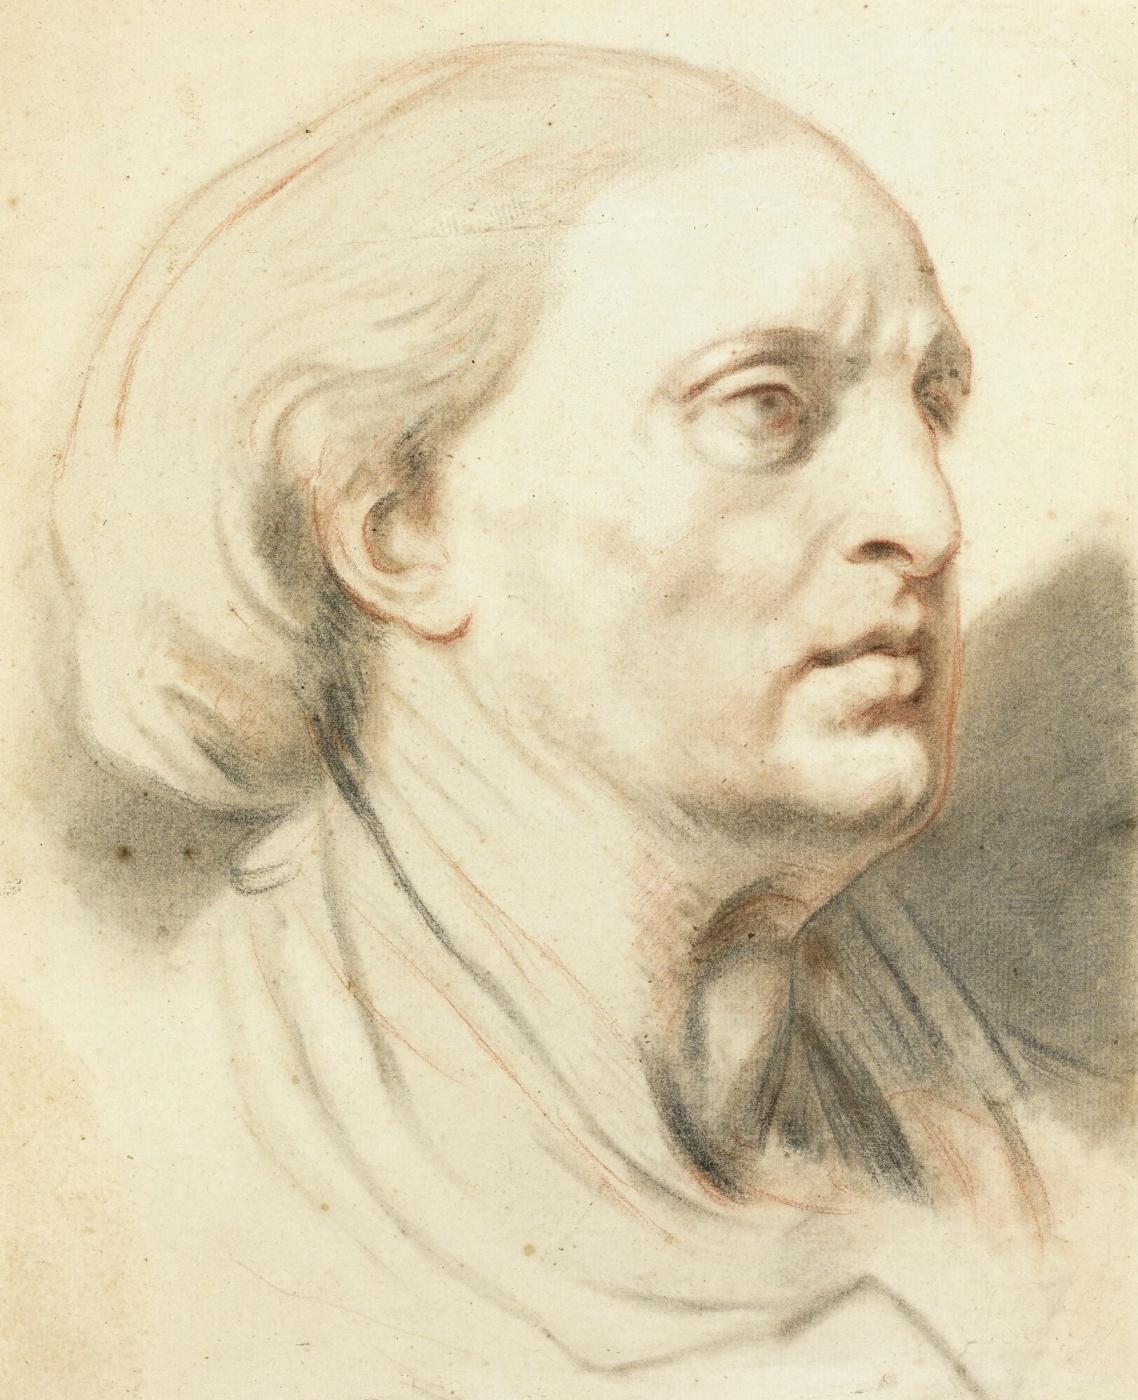 Jean-Baptiste Greuze. Portrait of a Man